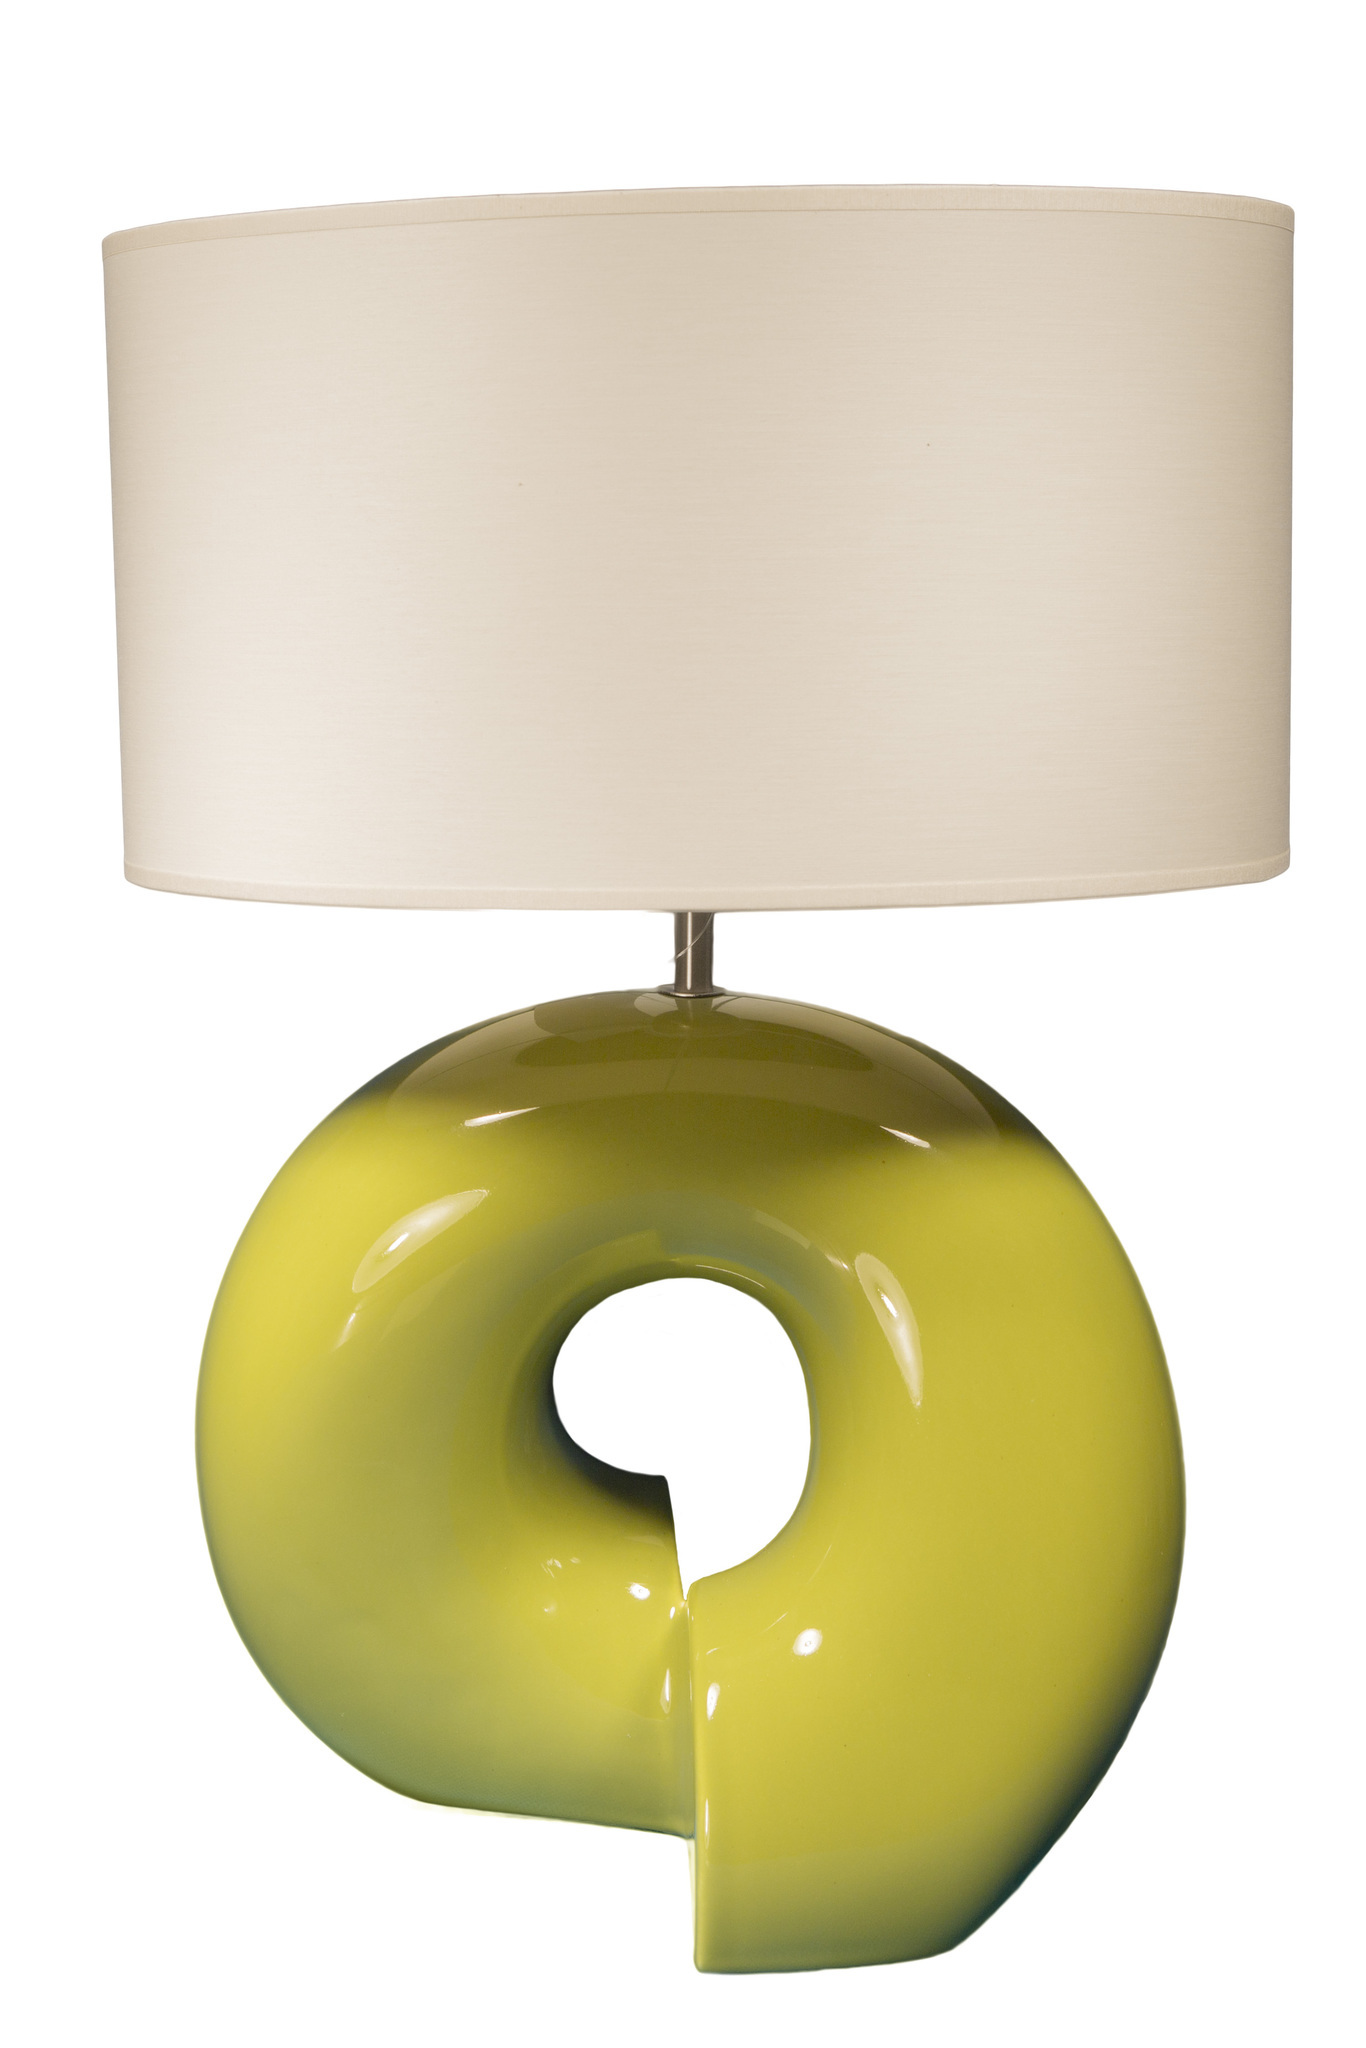 Элитная лампа настольная Визеу зеленая от Sporvil